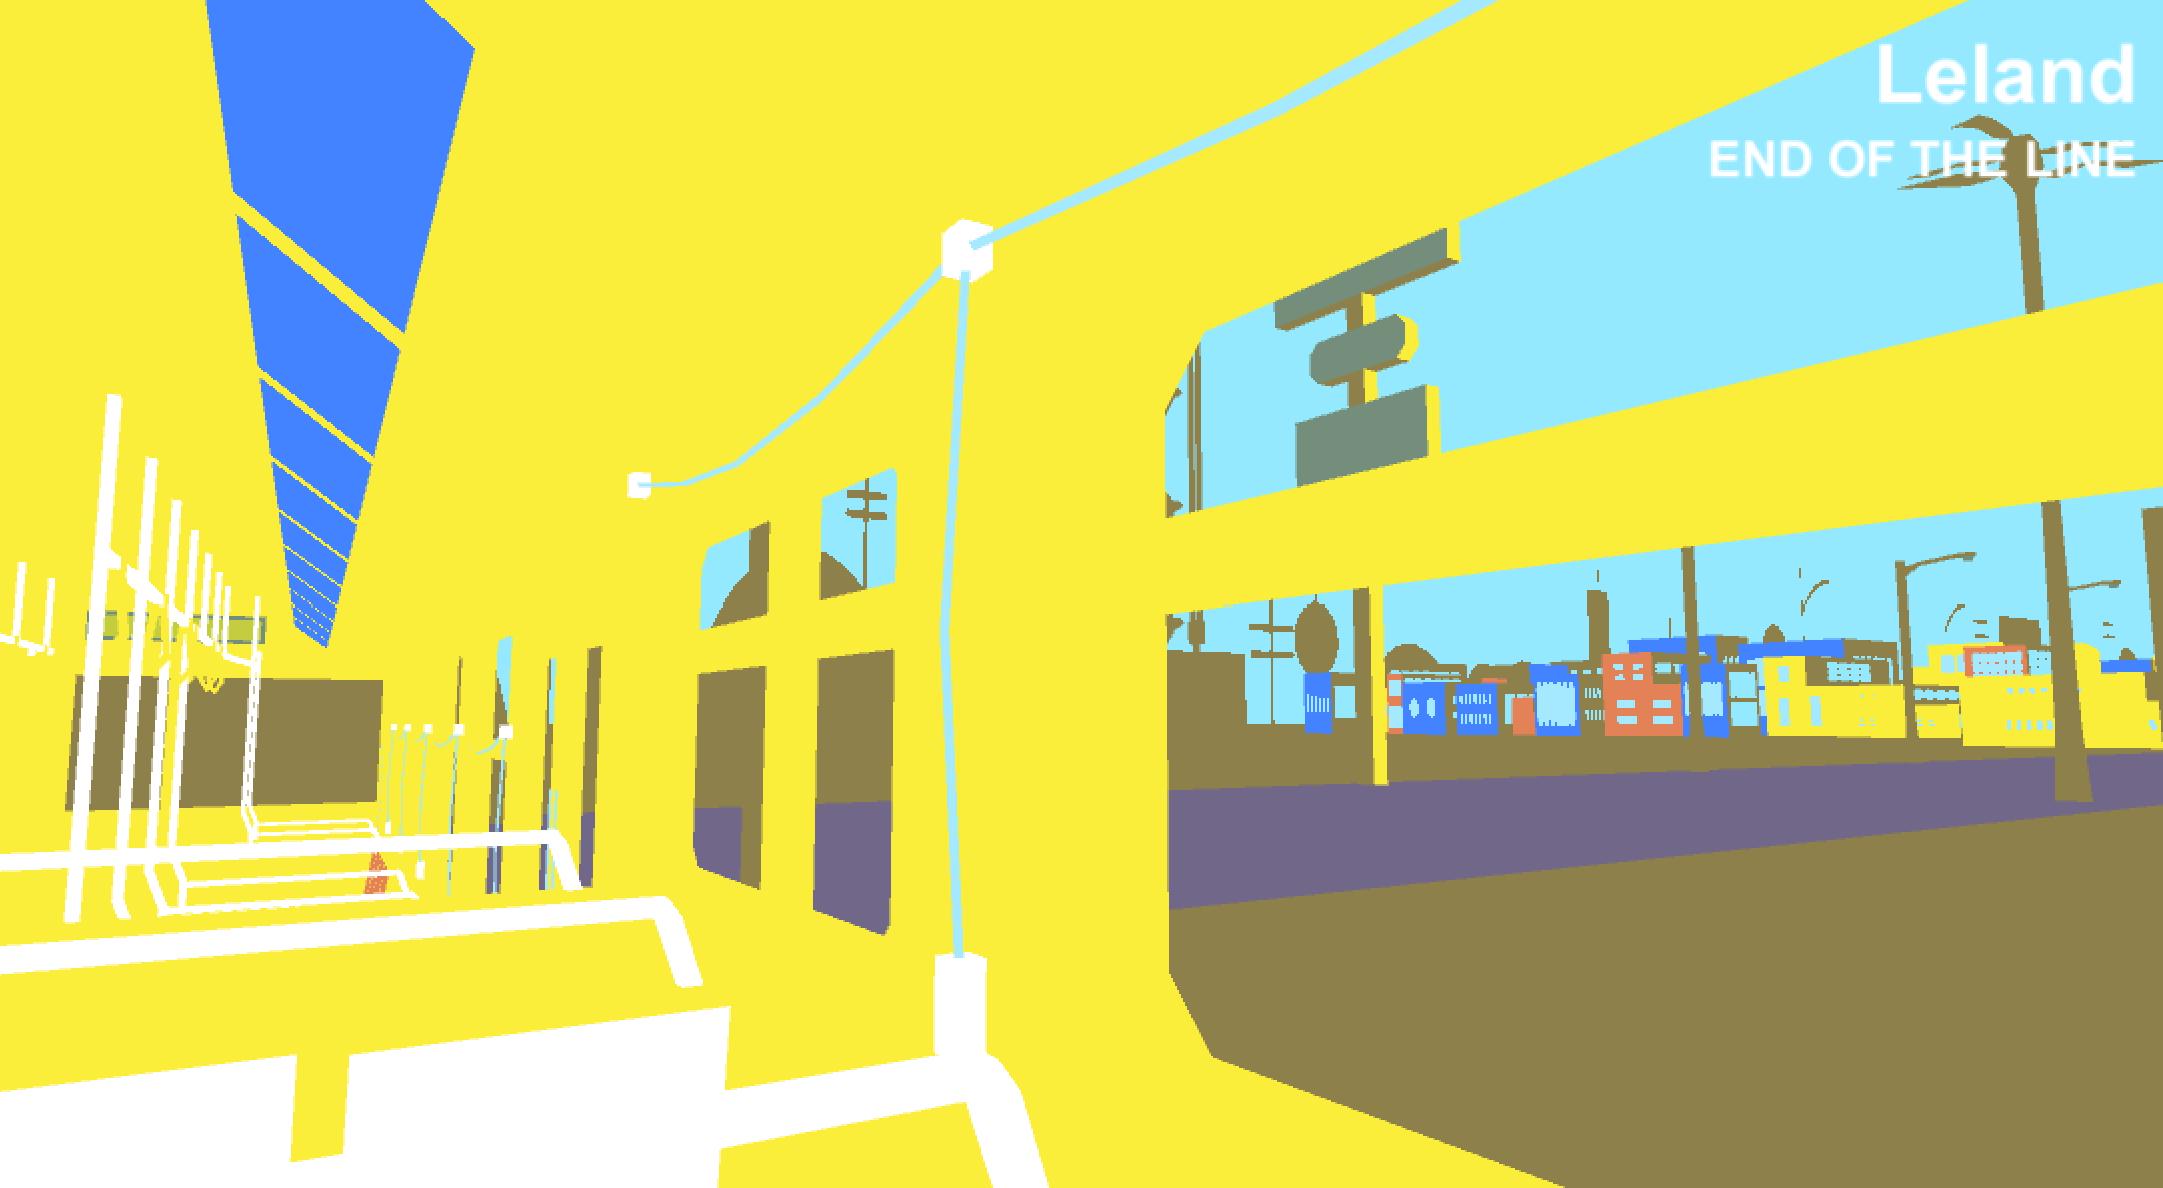 4Ever Transit Authority